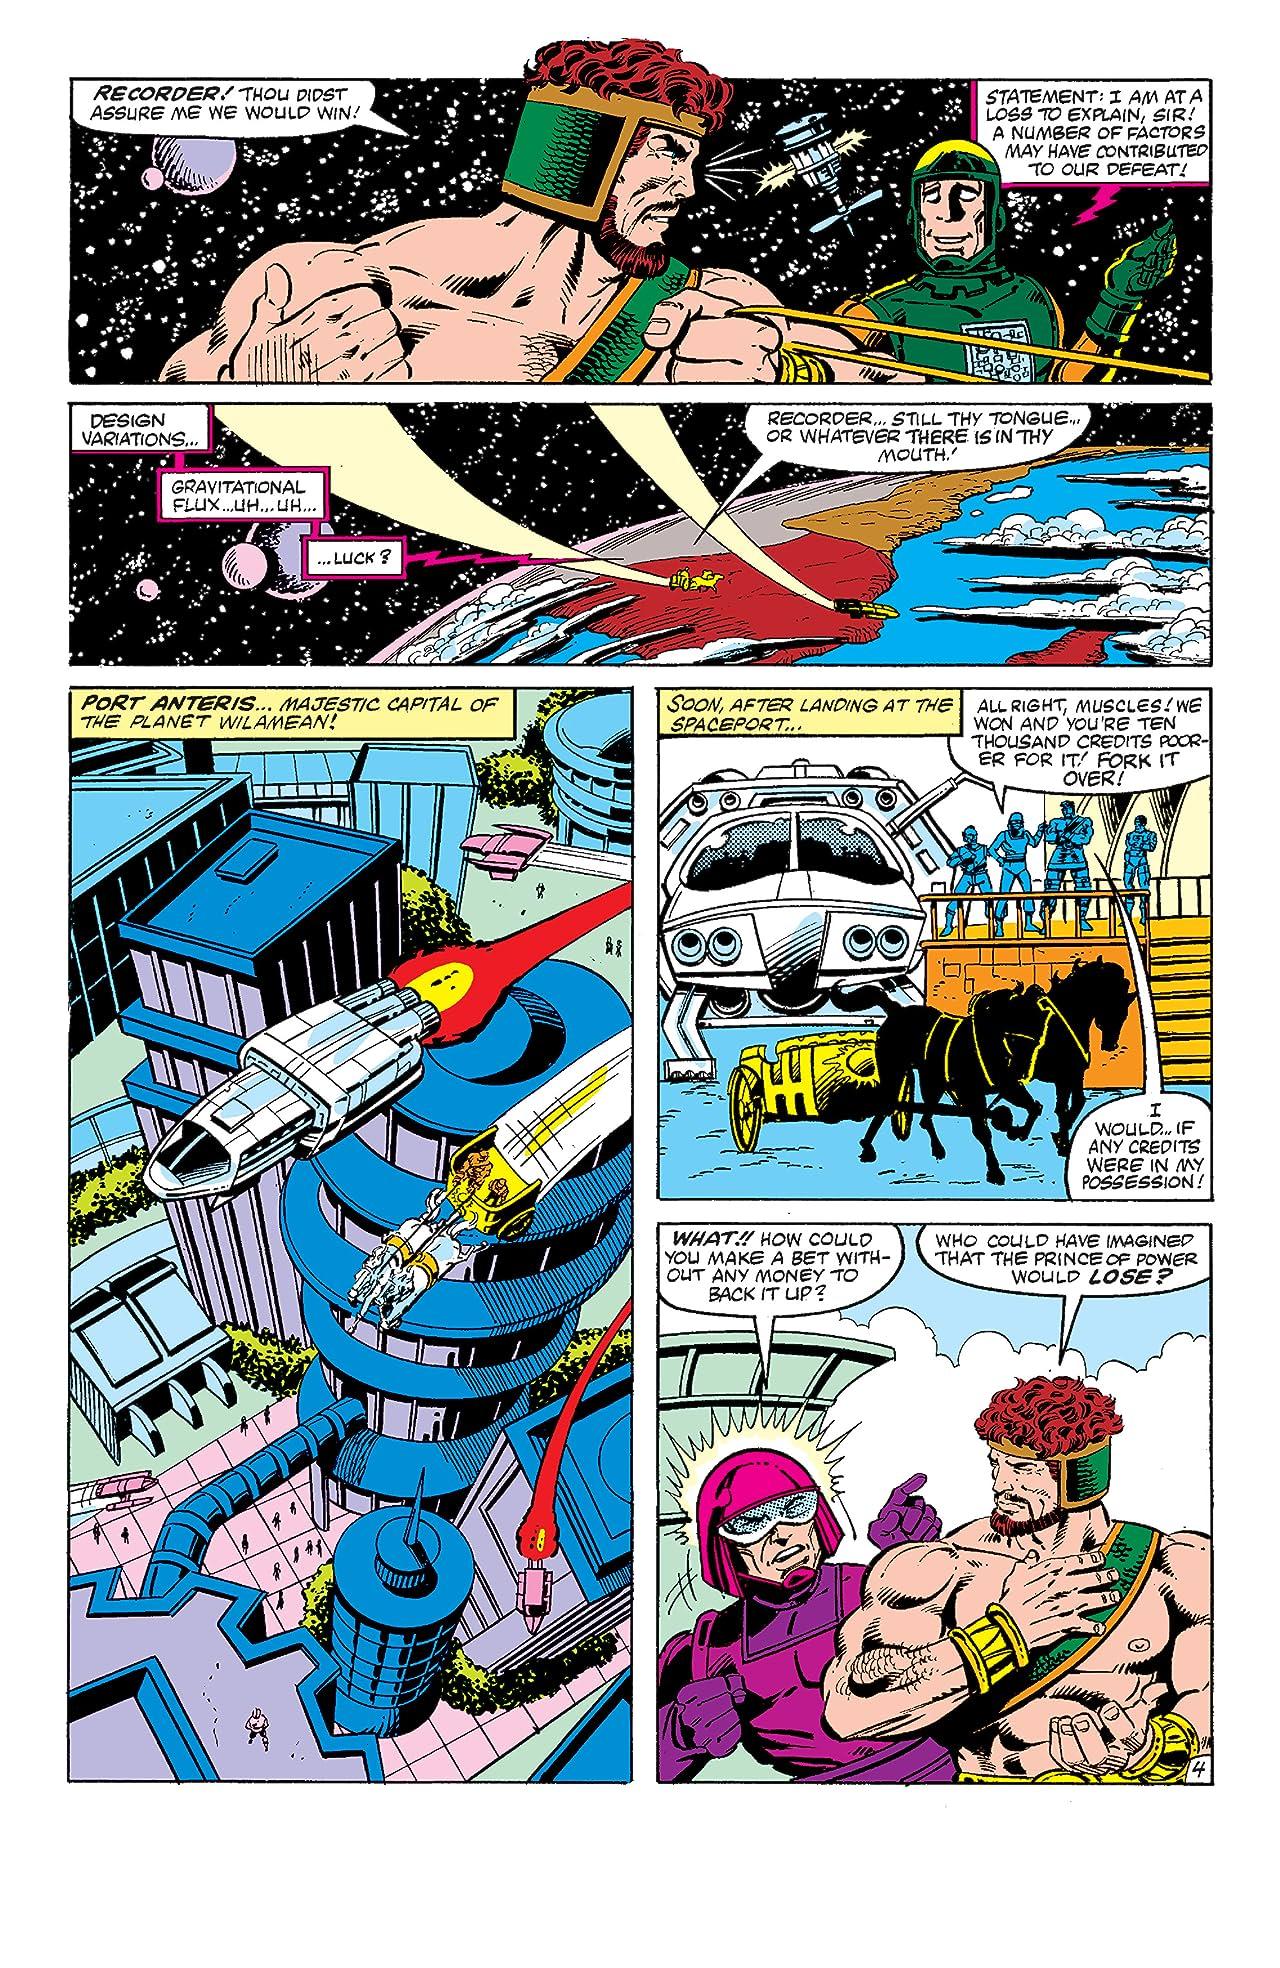 Hercules: Prince Of Power (1982) #2